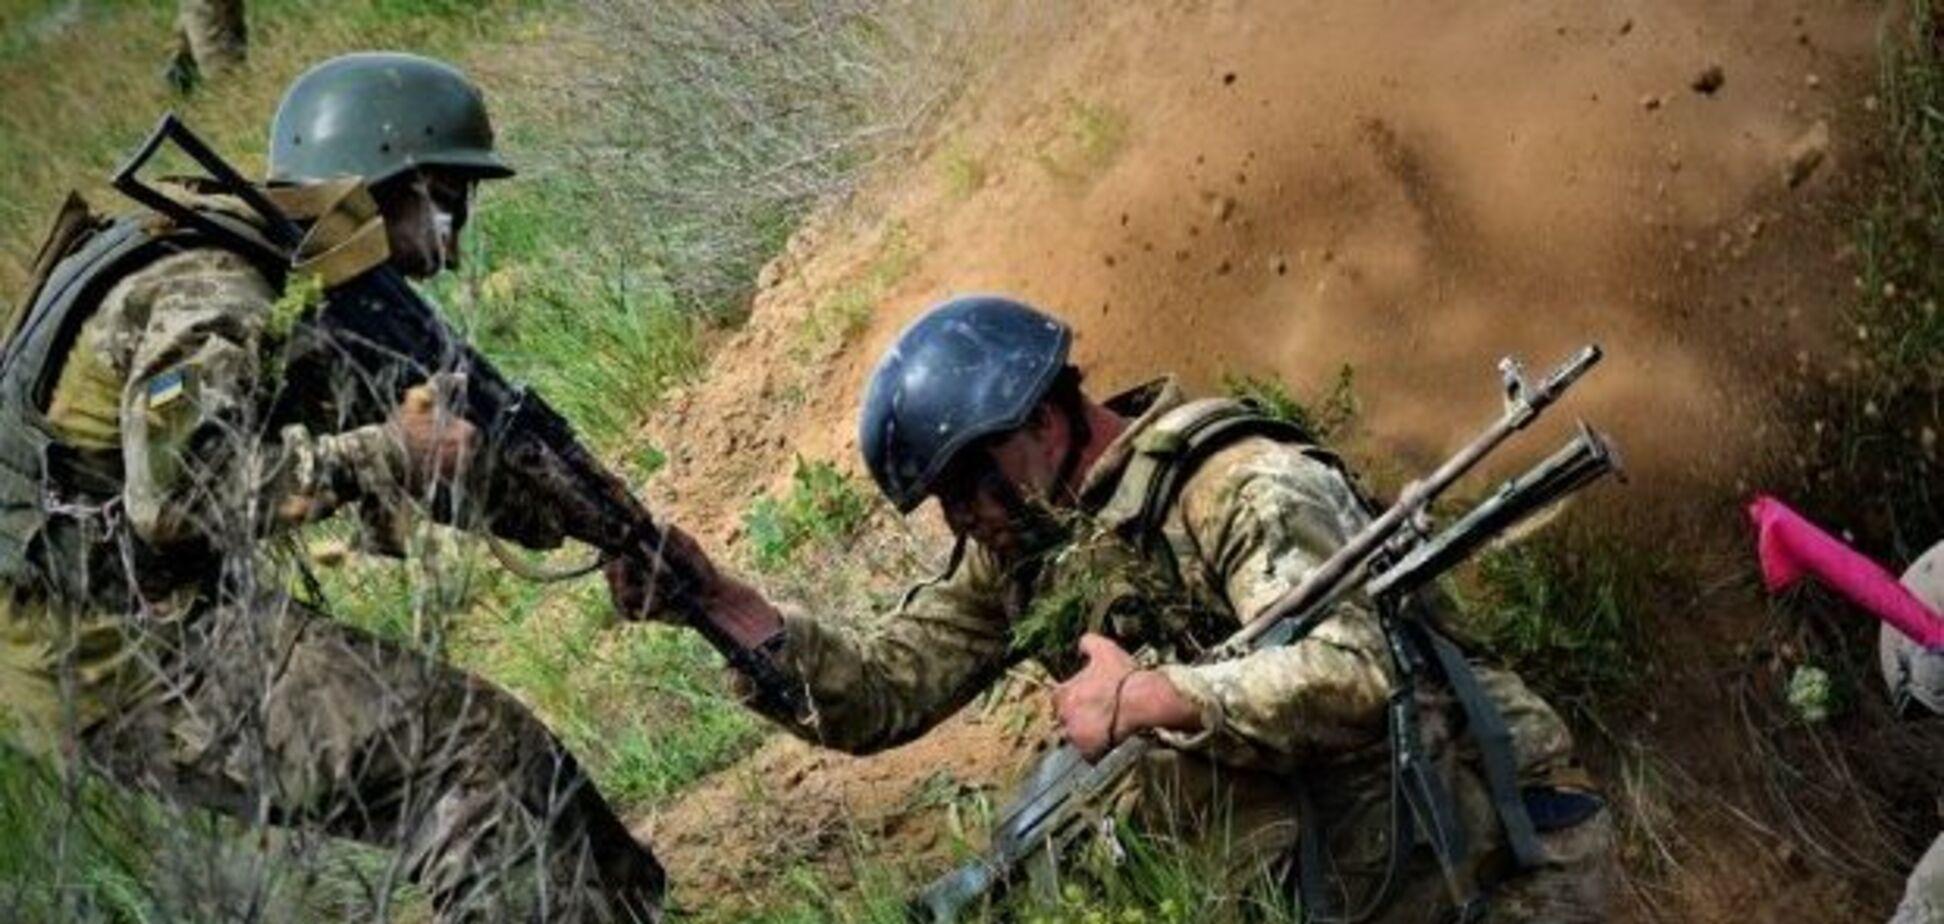 Боец из Кривого Рога подорвался на Донбассе